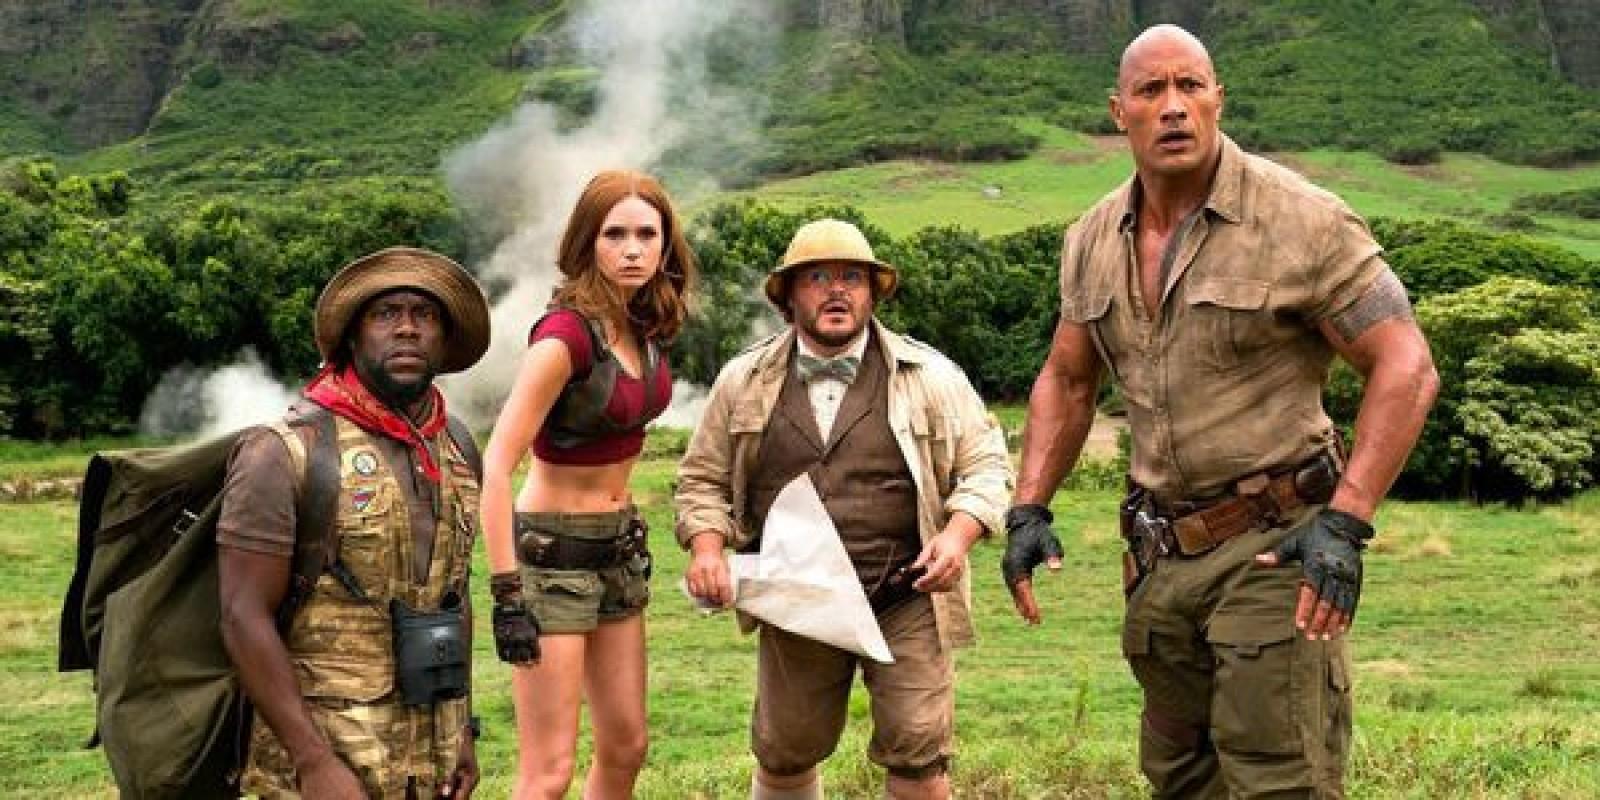 Jumanji-Welcome-to-the-Jungle-cast.jpg